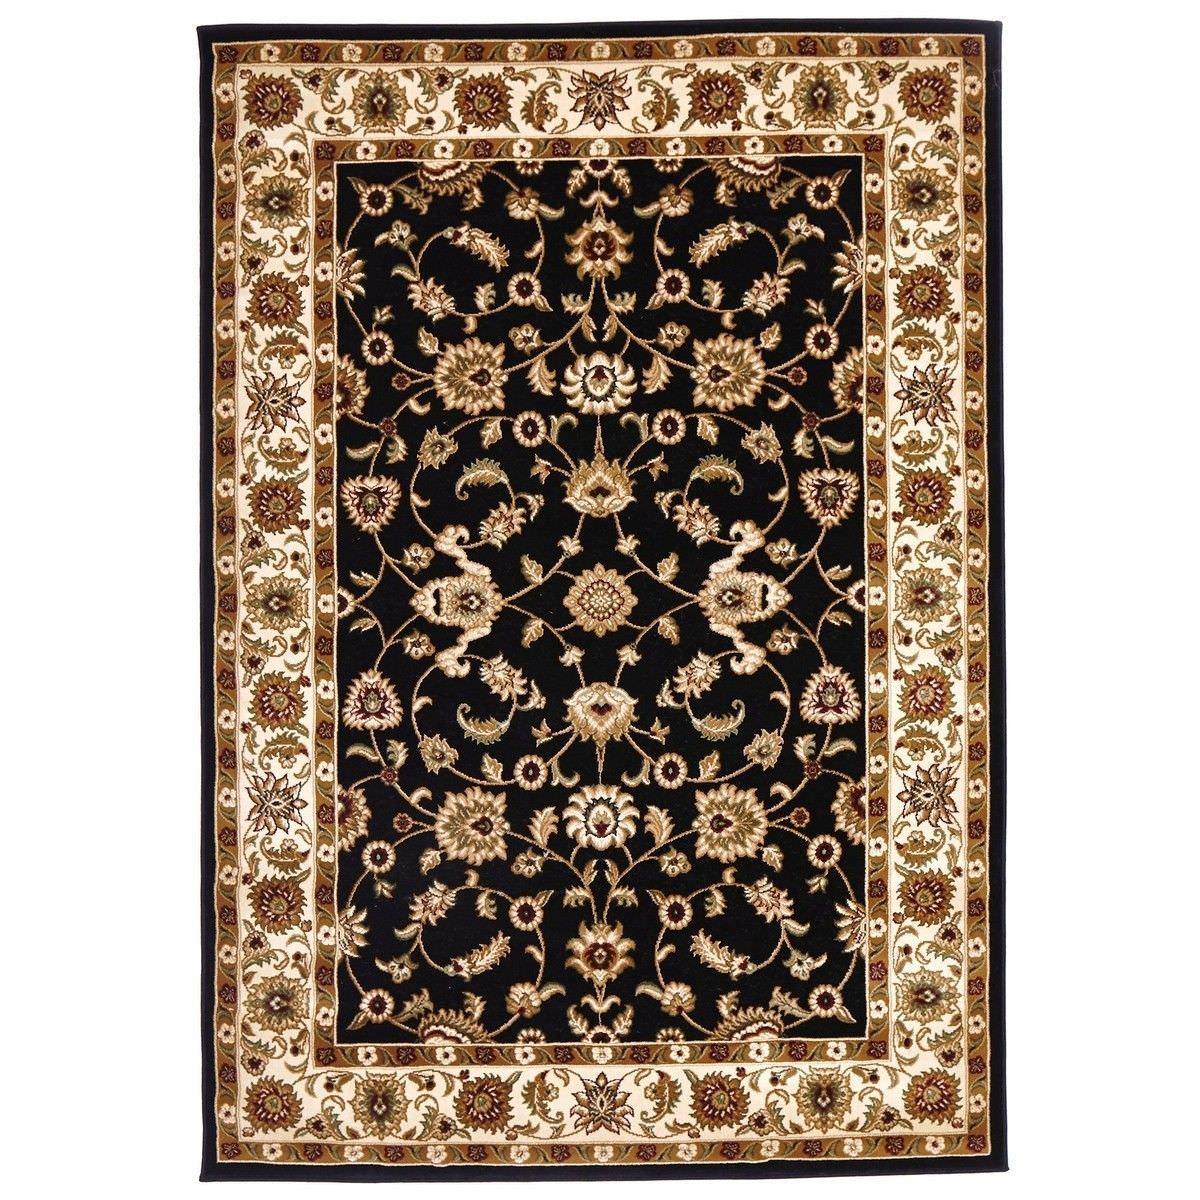 Sydney Classic Turkish Made Oriental Rug, 400x300cm, Black / Ivory